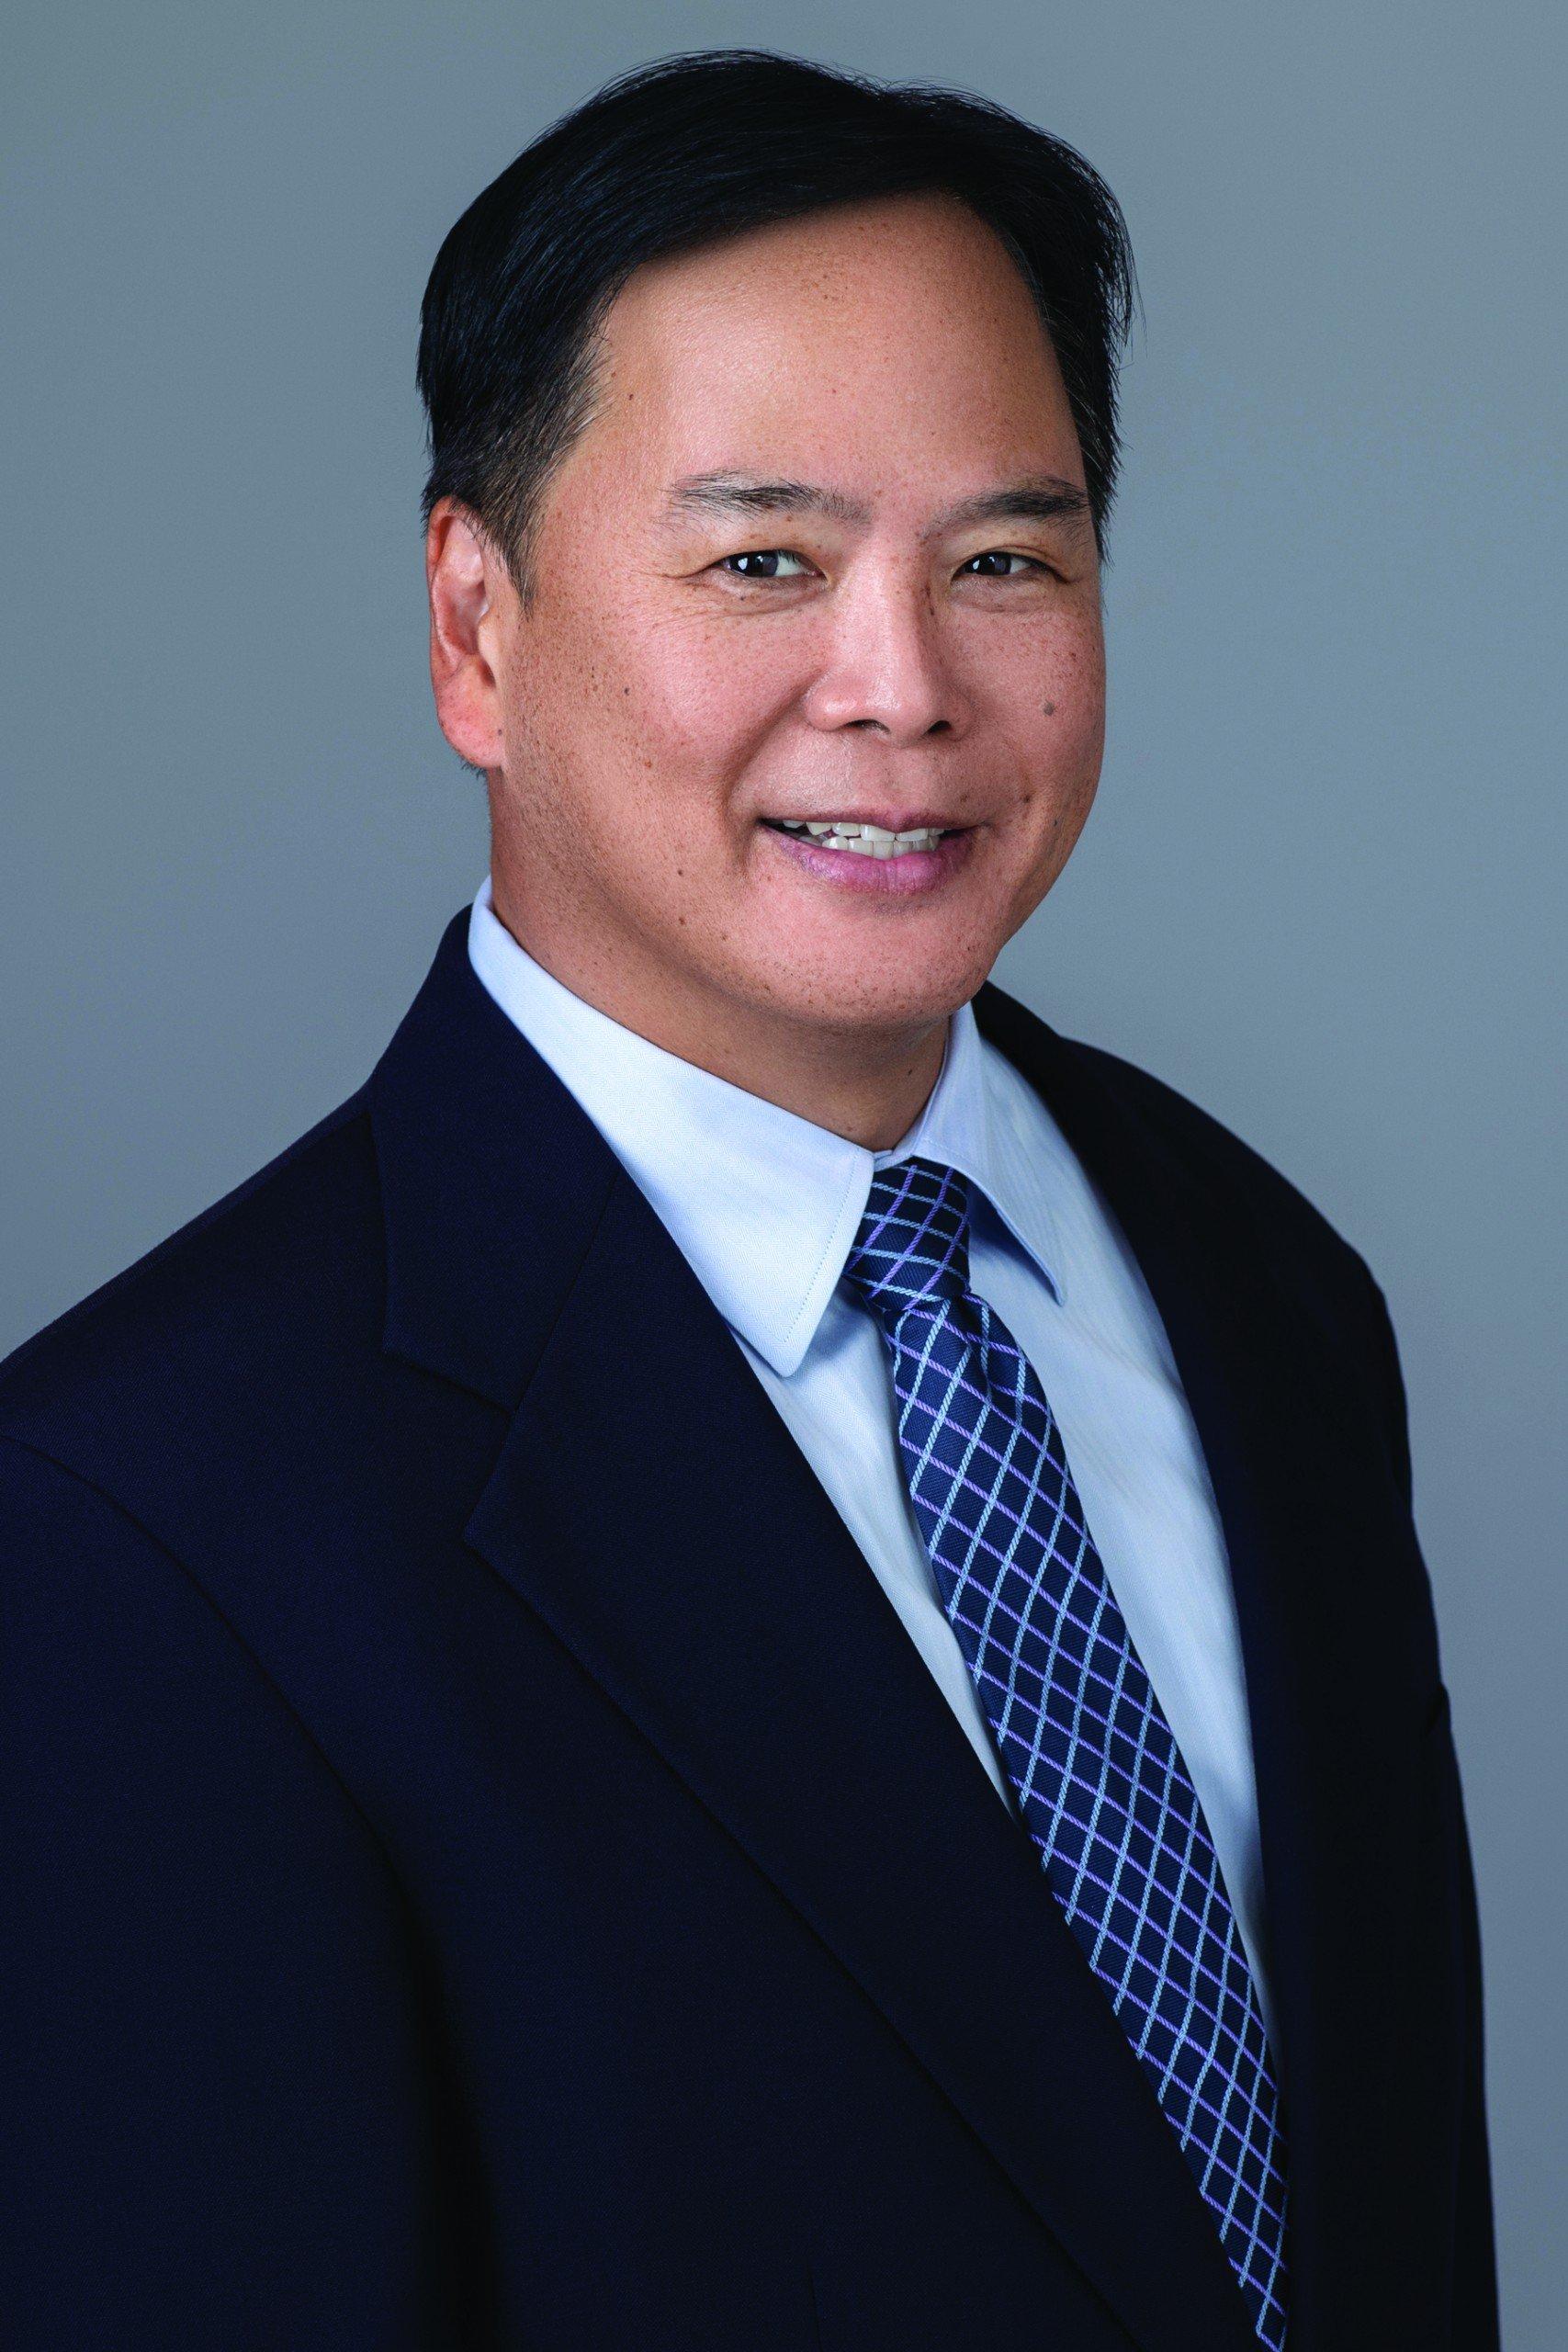 Todd K. Haruki, D.D.S., M.S.